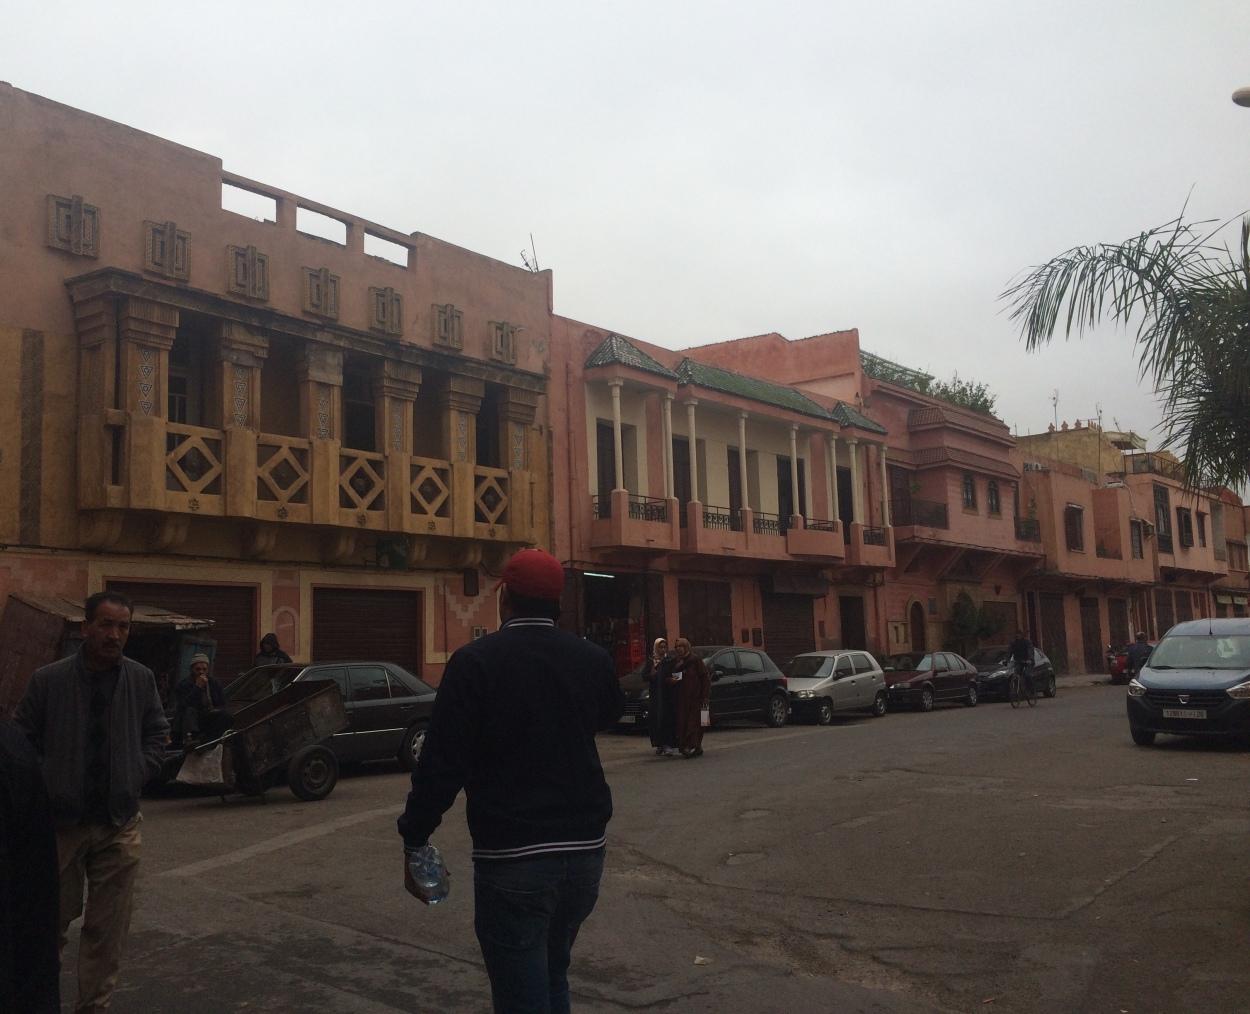 Marrakech Mellah